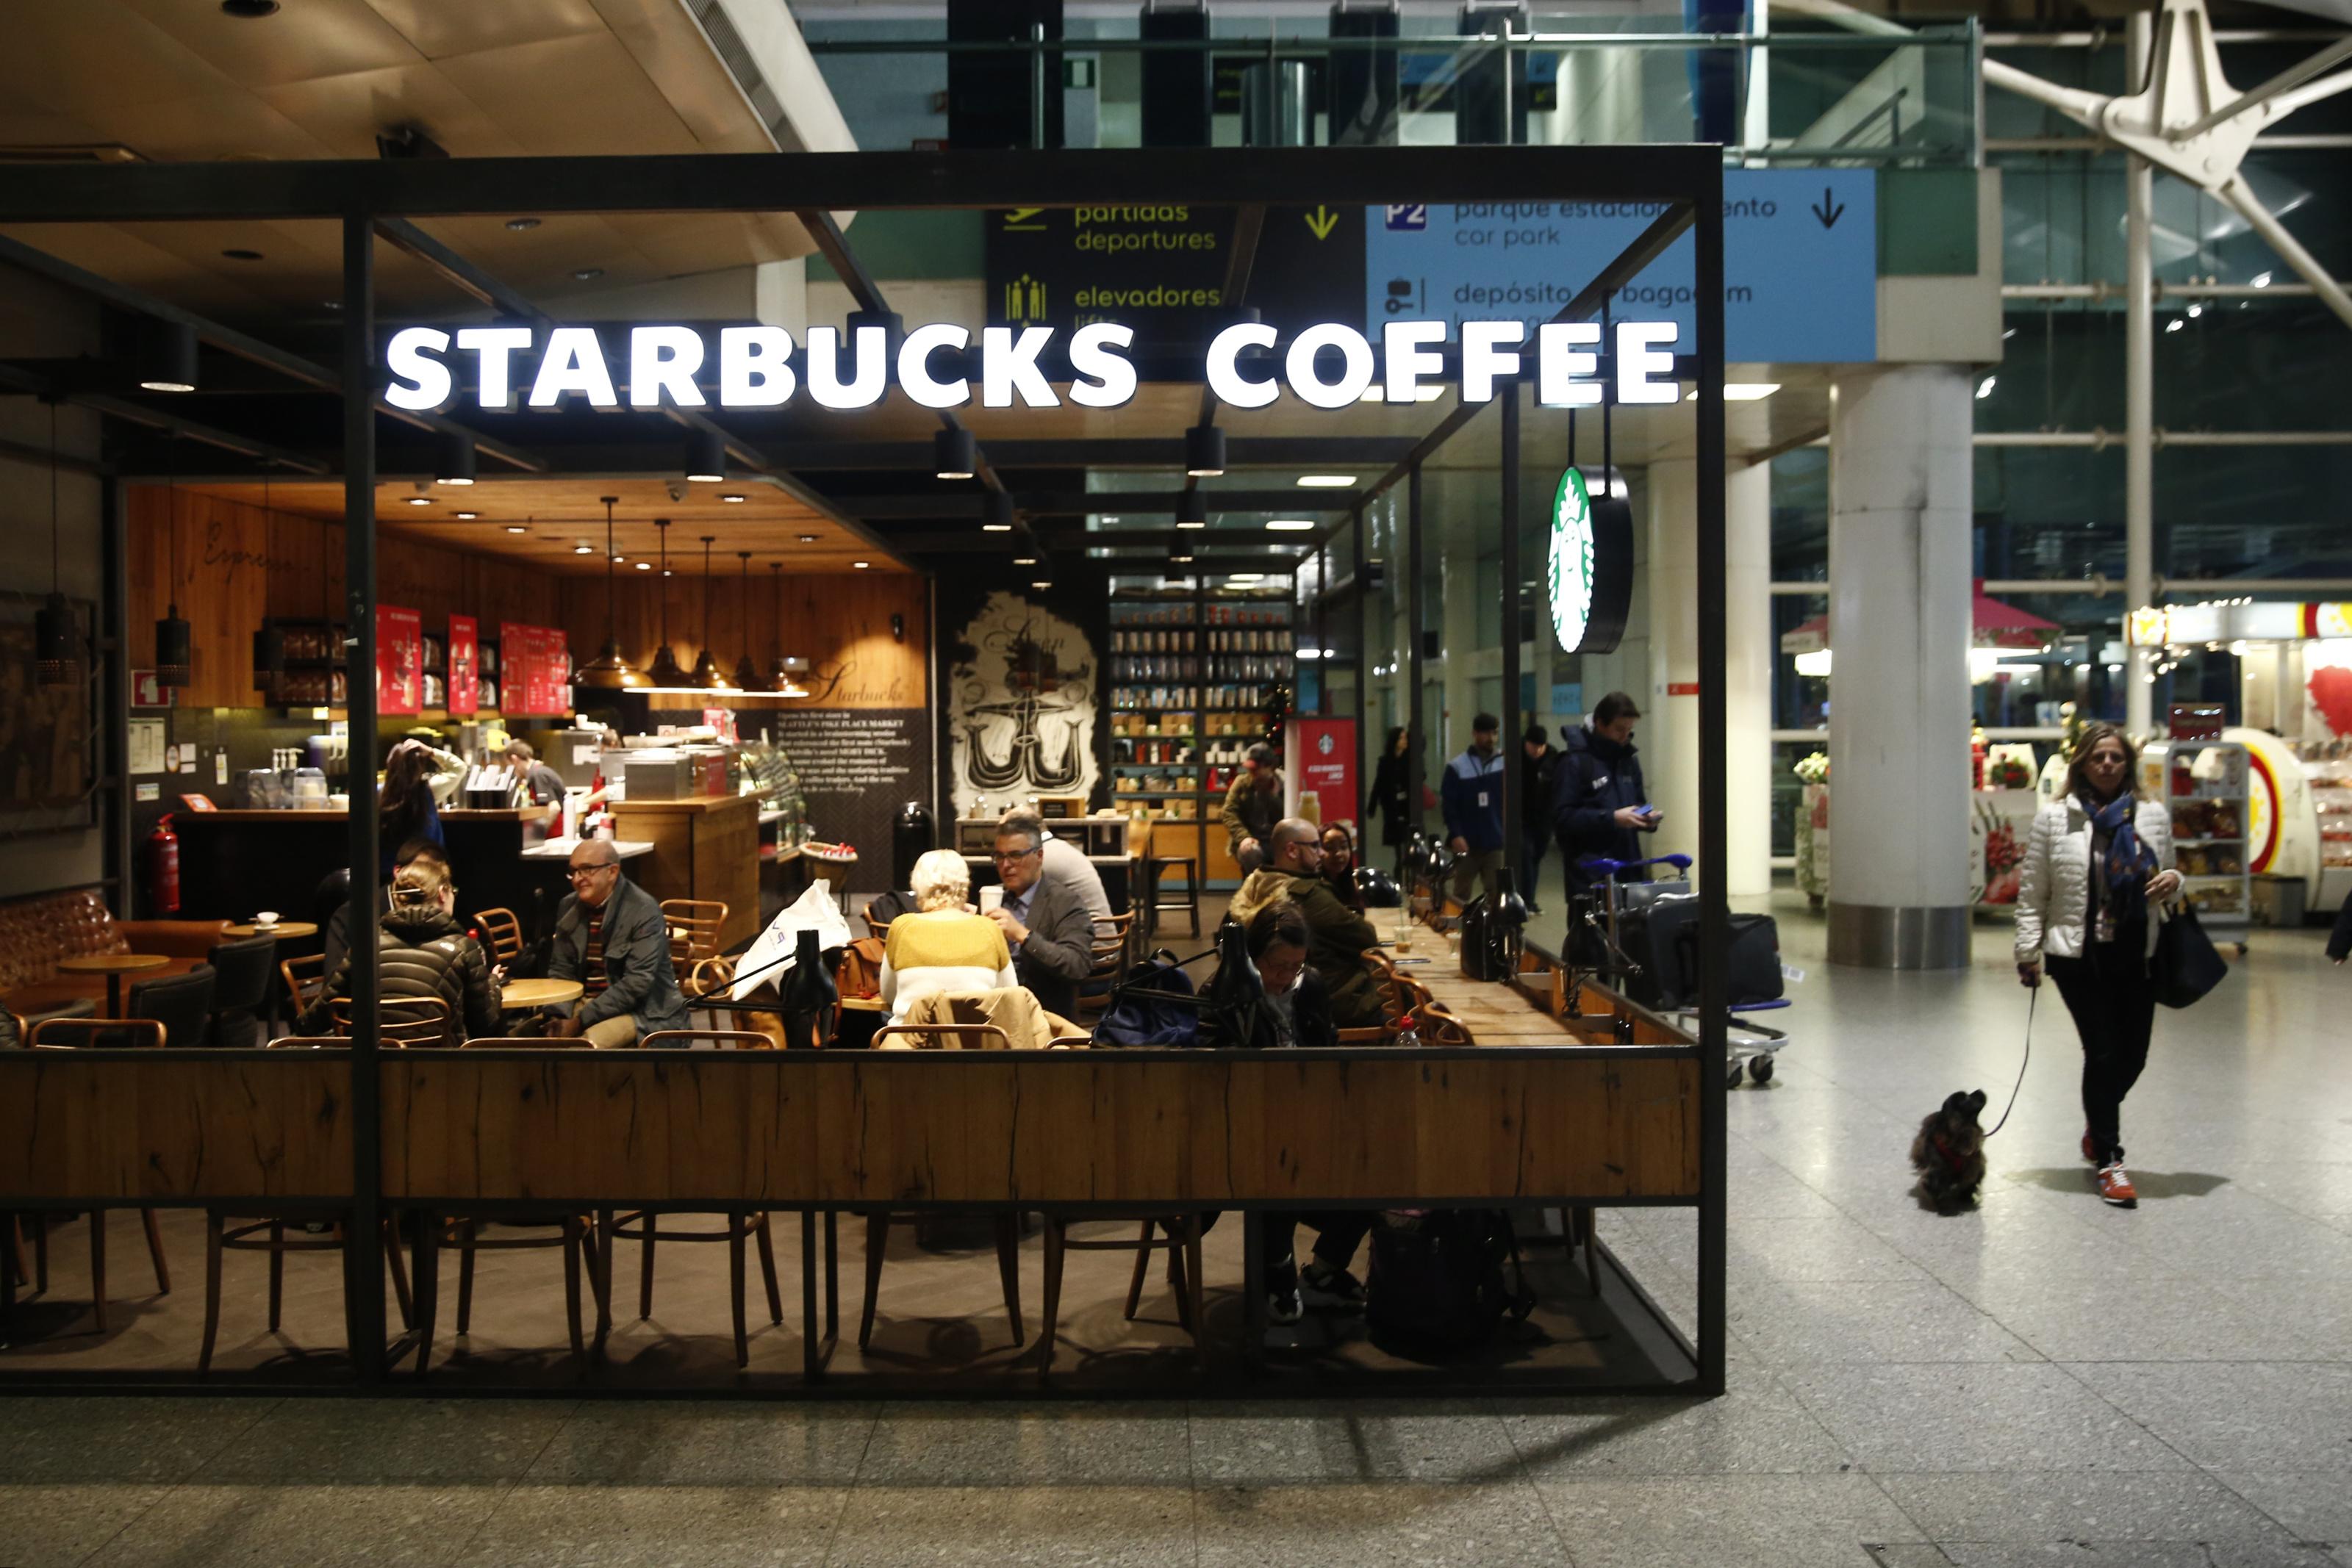 Starbucks Christmas Eve Hours 2021 Boone Nc Is Starbucks Open On Christmas Eve 2020